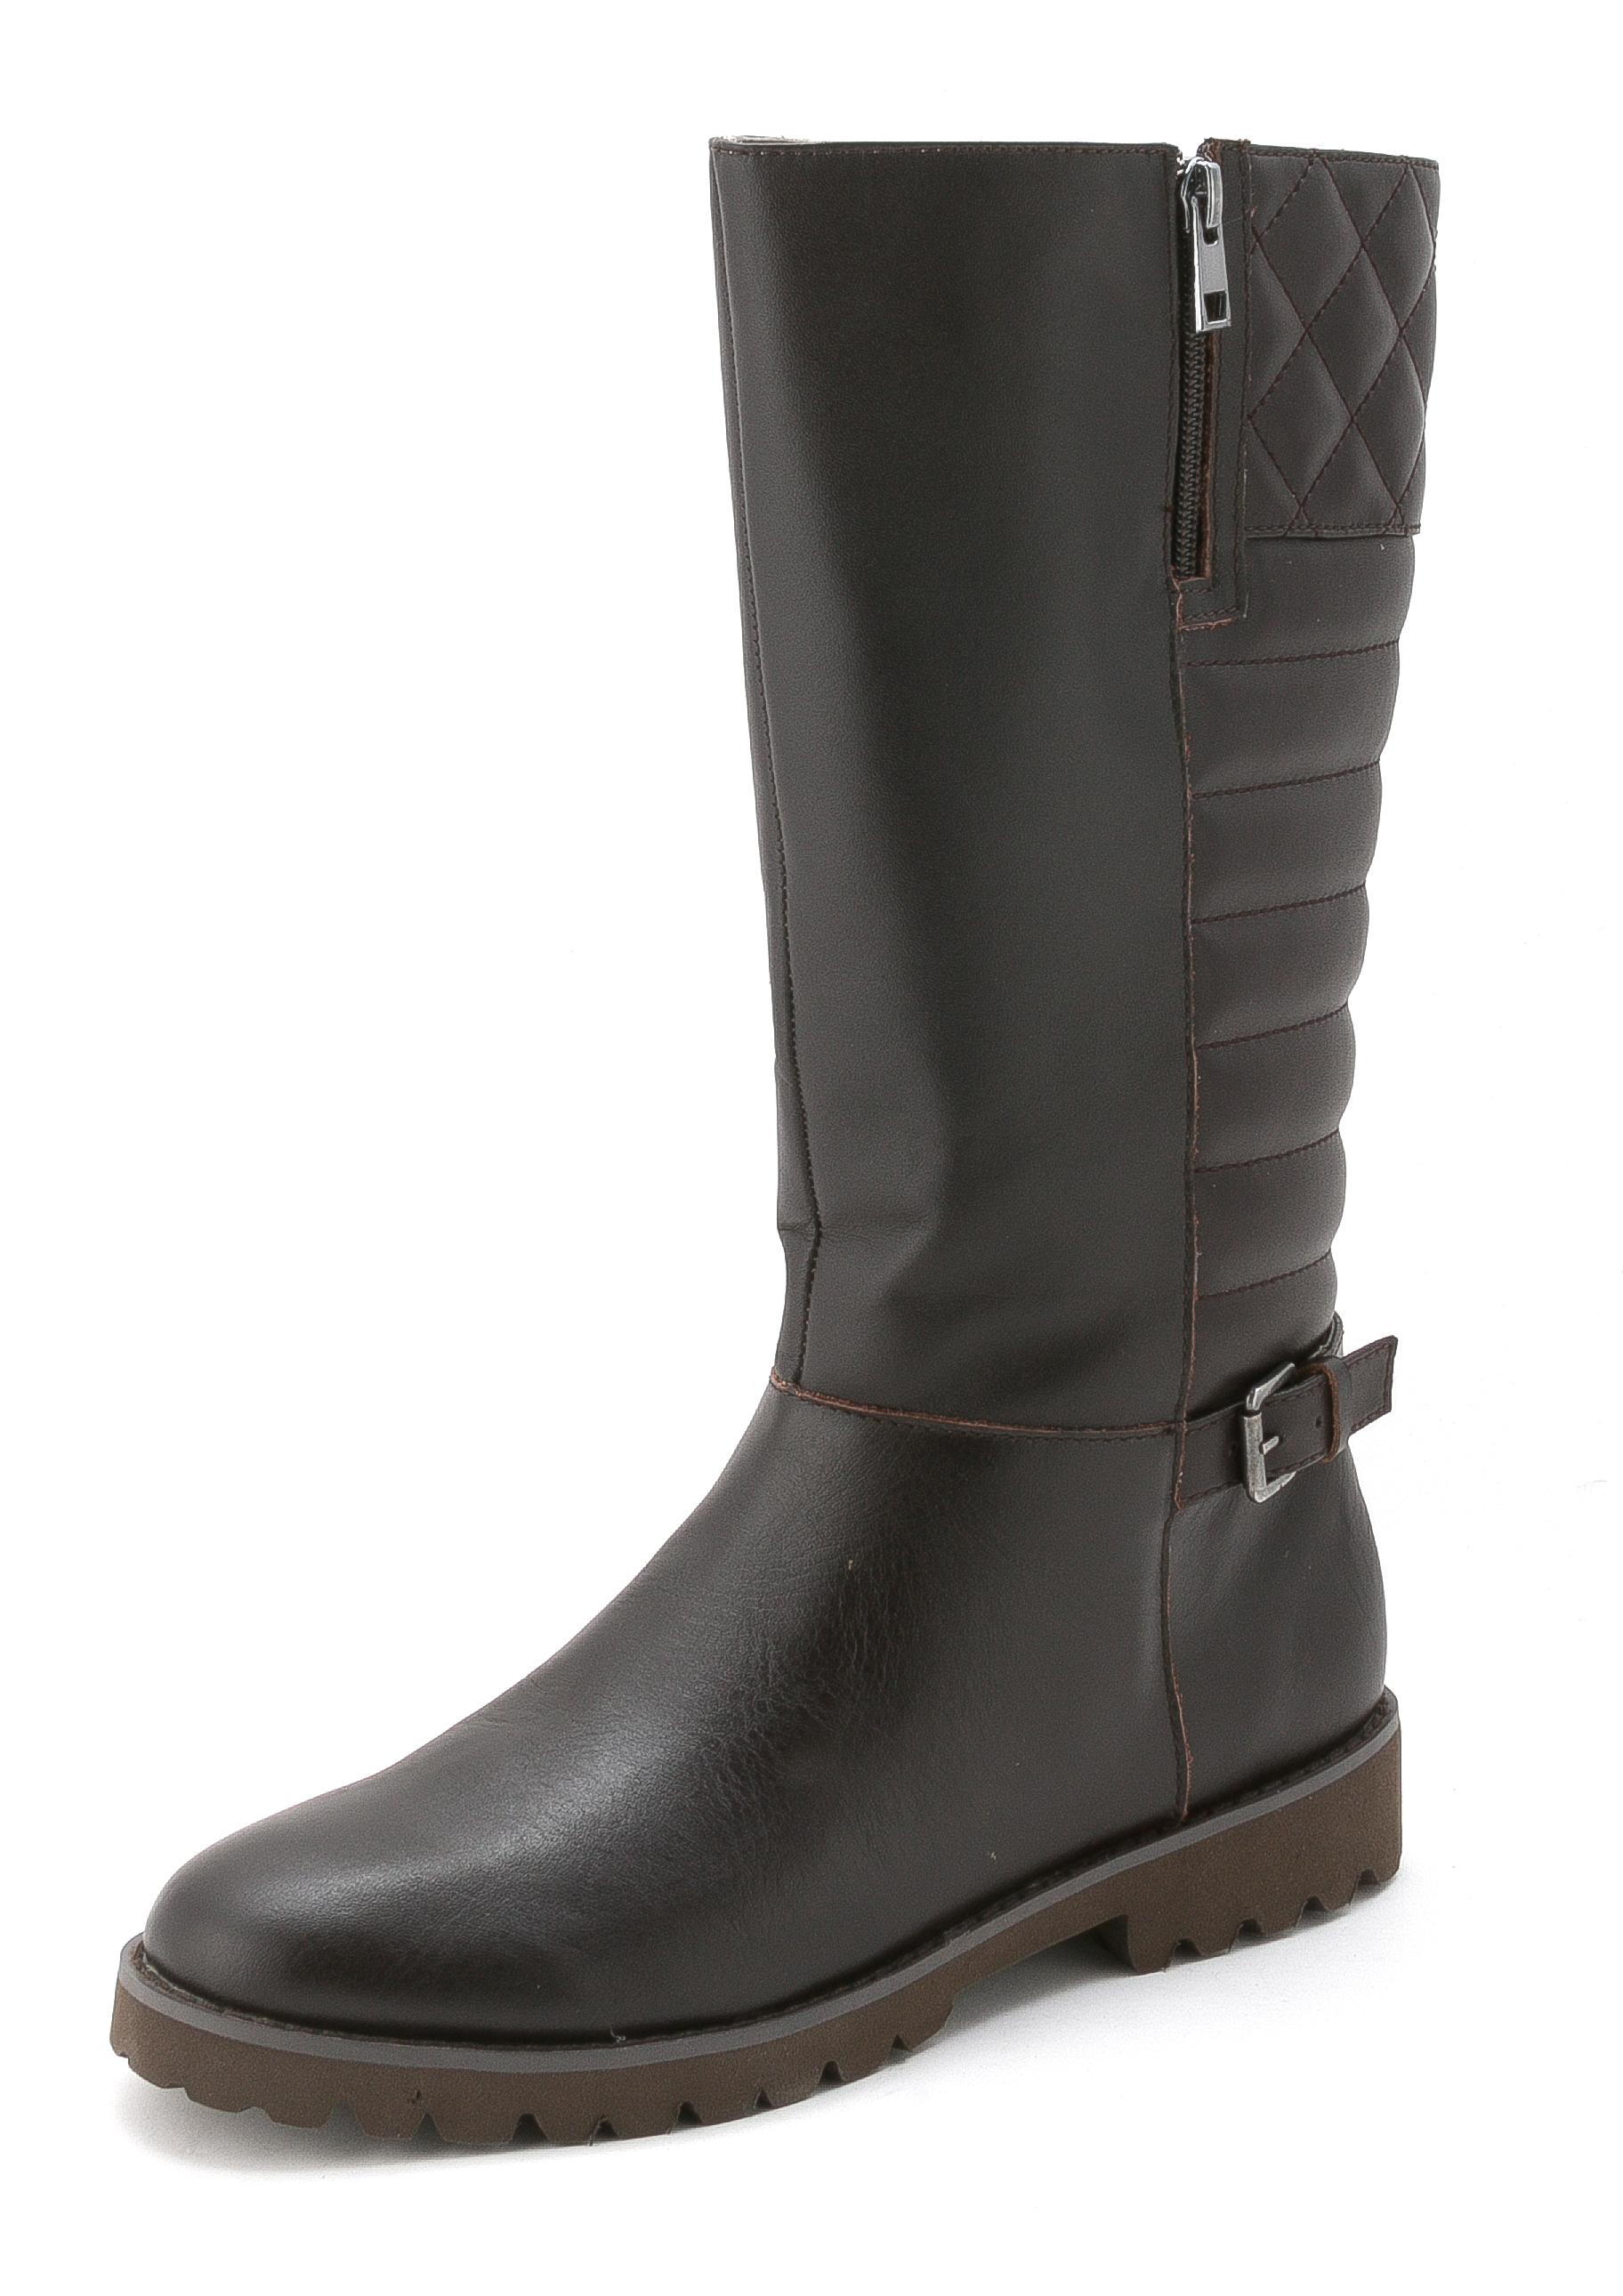 Womens briano Leather Almond Toe Mid-Calf Fashion Boots